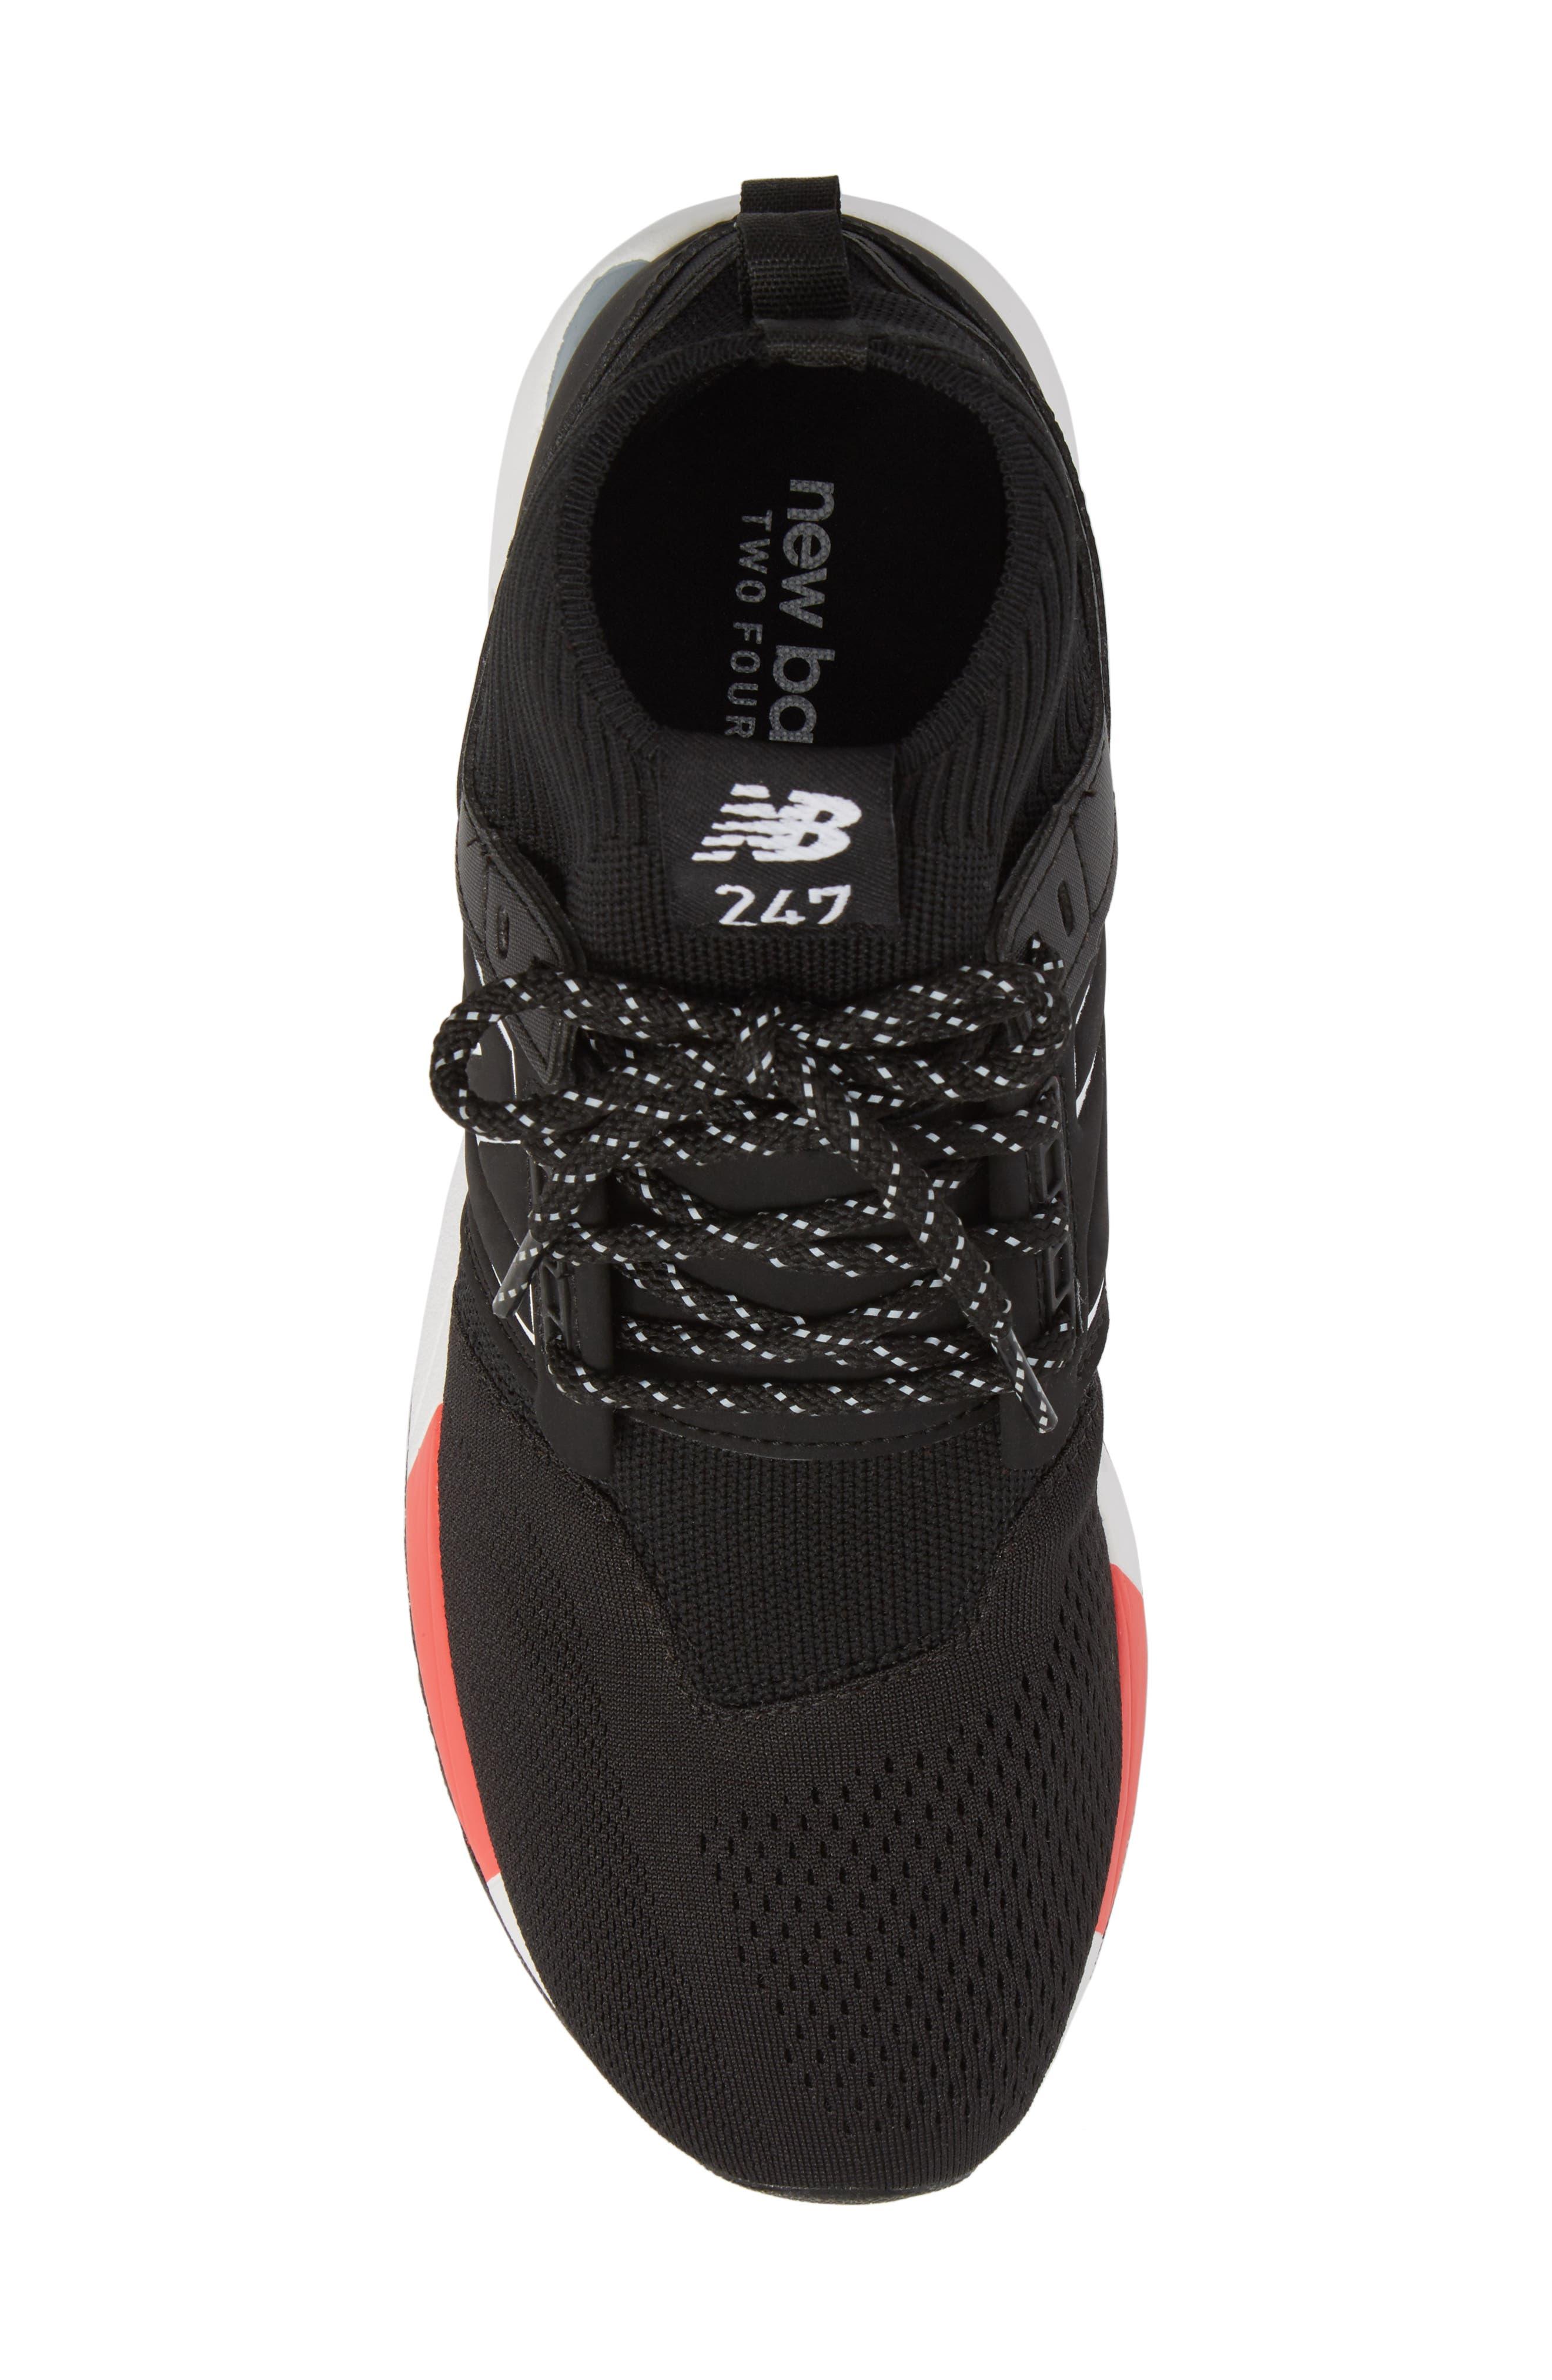 247 Mid Sneaker,                             Alternate thumbnail 5, color,                             Black